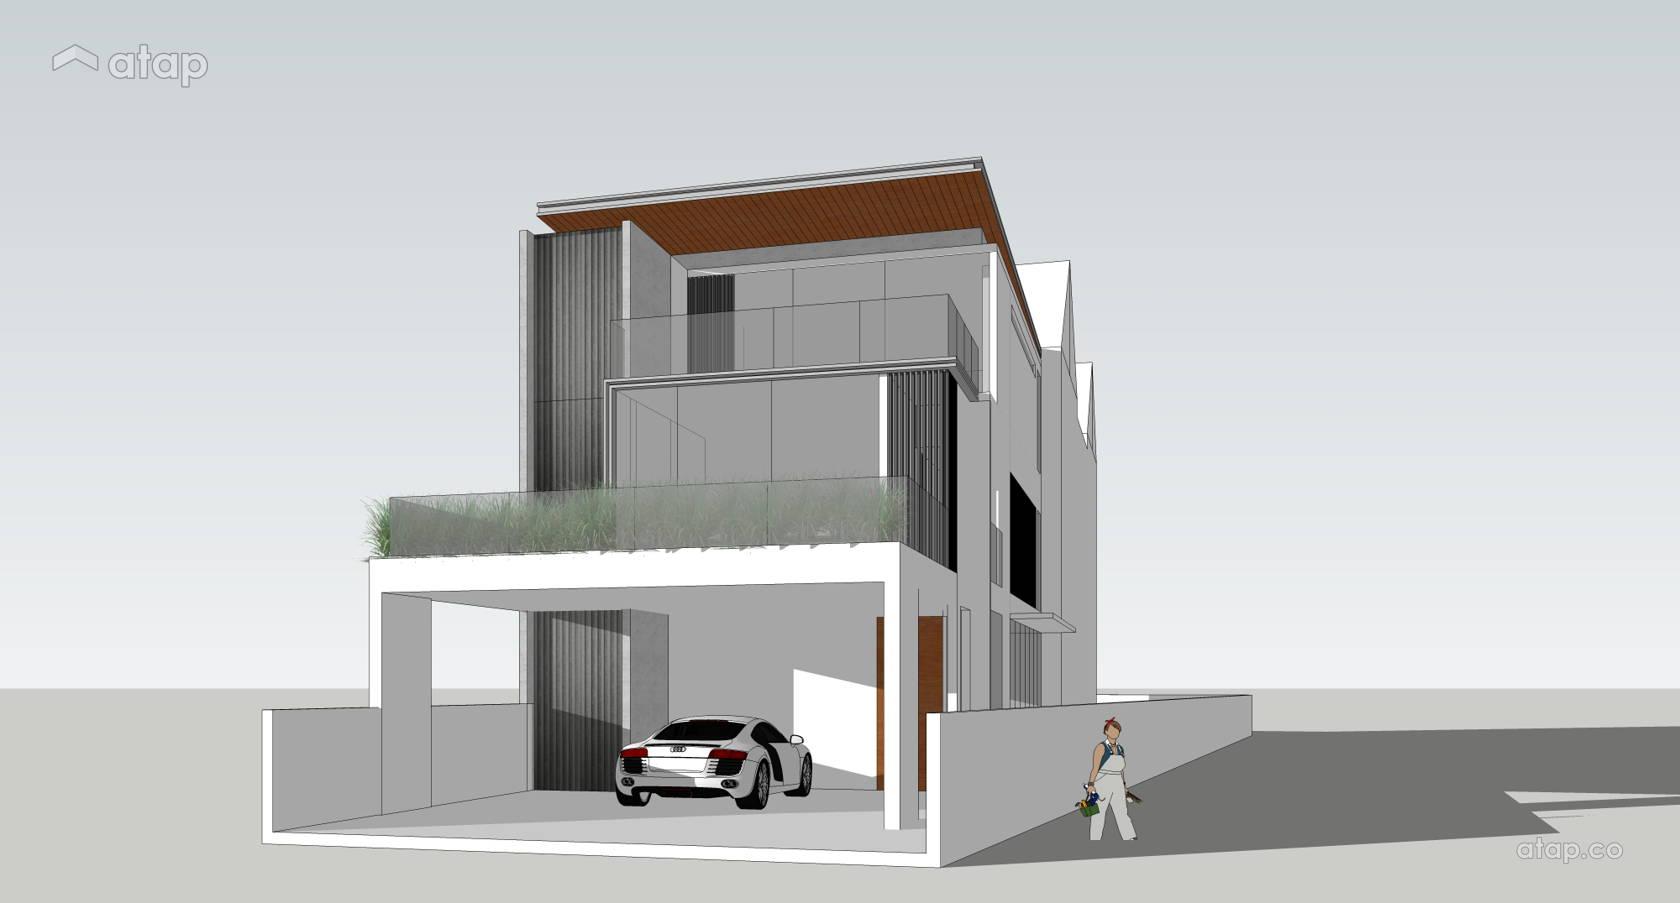 Great Taman Espaland Semi D Extension Architectural U0026 Interior Design Renovation  Ideas, Photos And Price In Malaysia | Atap.co